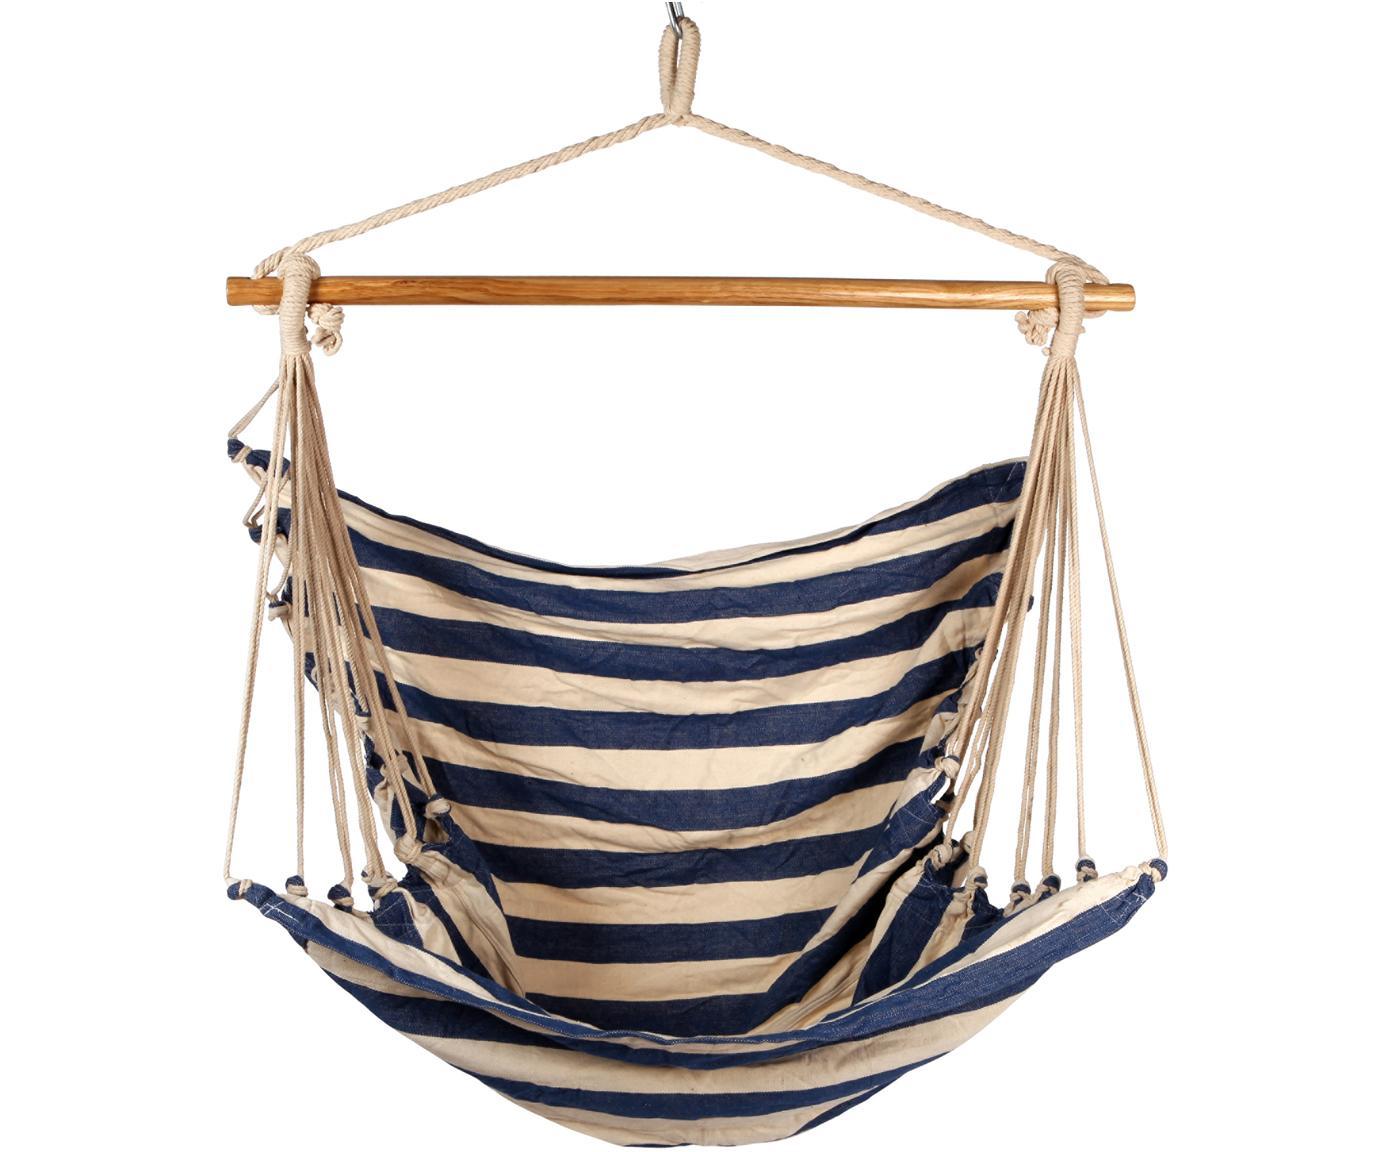 Hangstoel Monkey, Zitvlak: 65% katoen, 35% polyester, Frame: hout, Blauw, crèmekleurig, houtkleurig, 100 x 130 cm